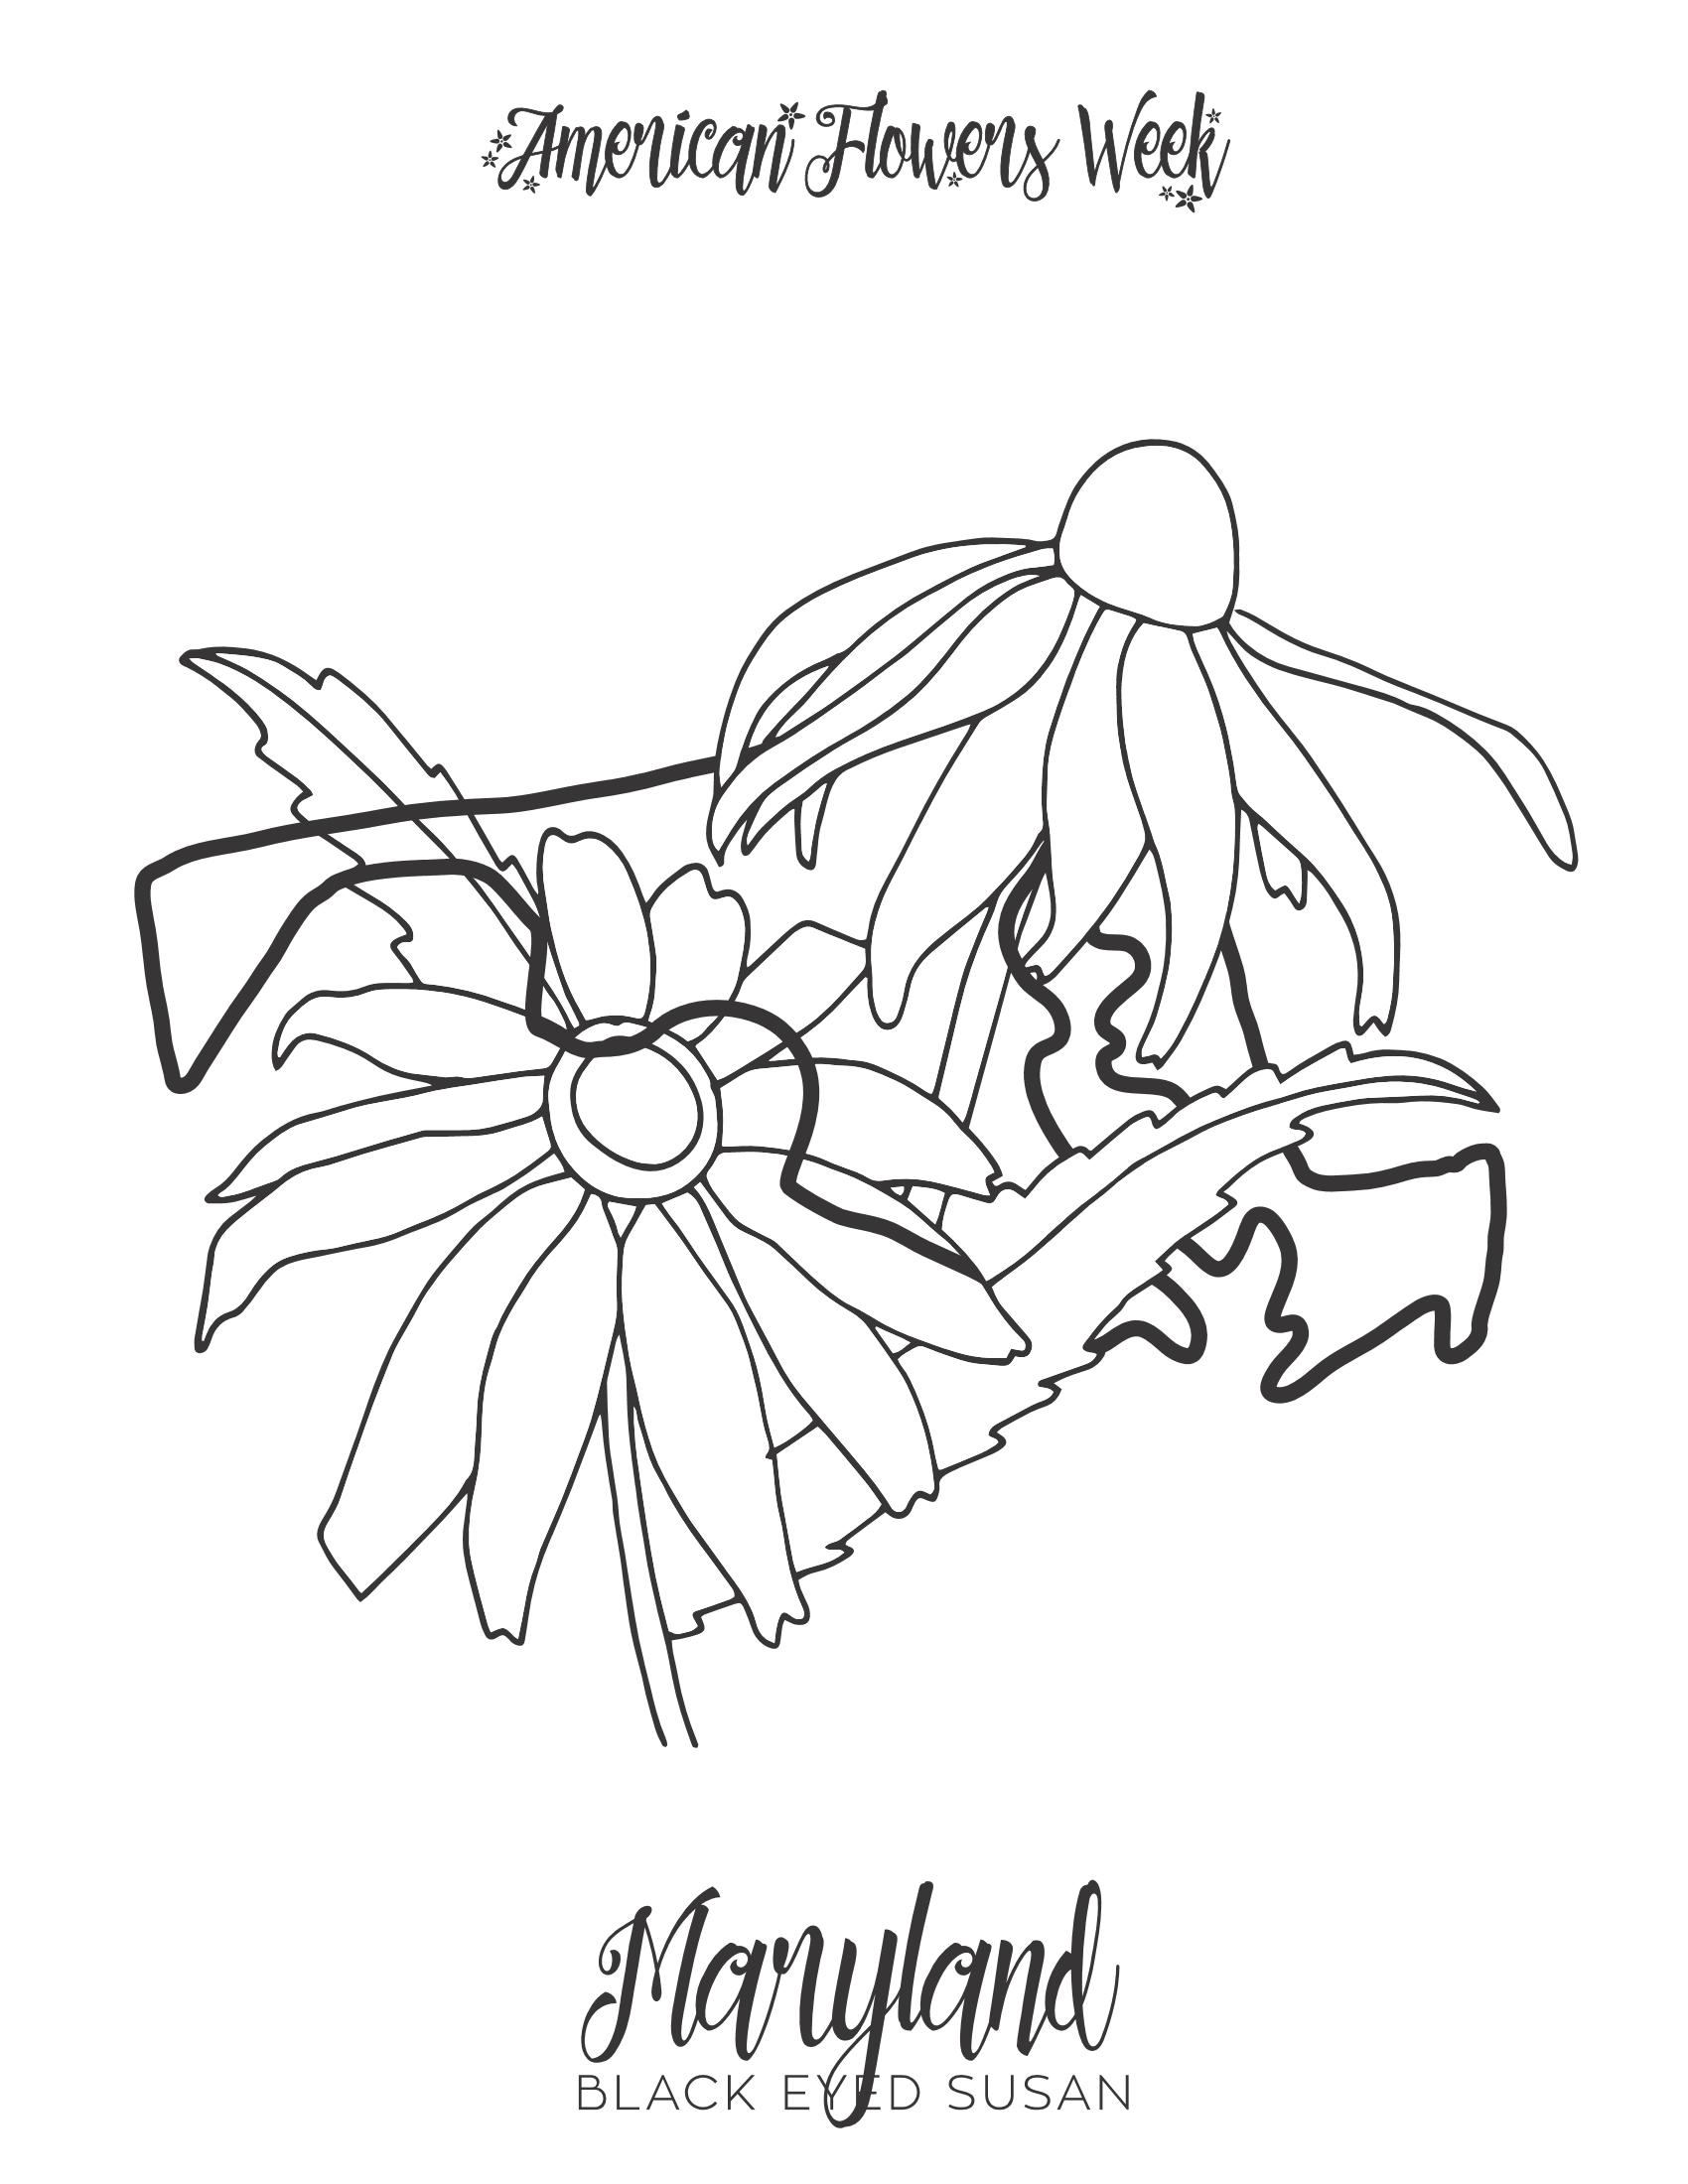 50 State Flowers — Free Coloring Pages - american flowers week